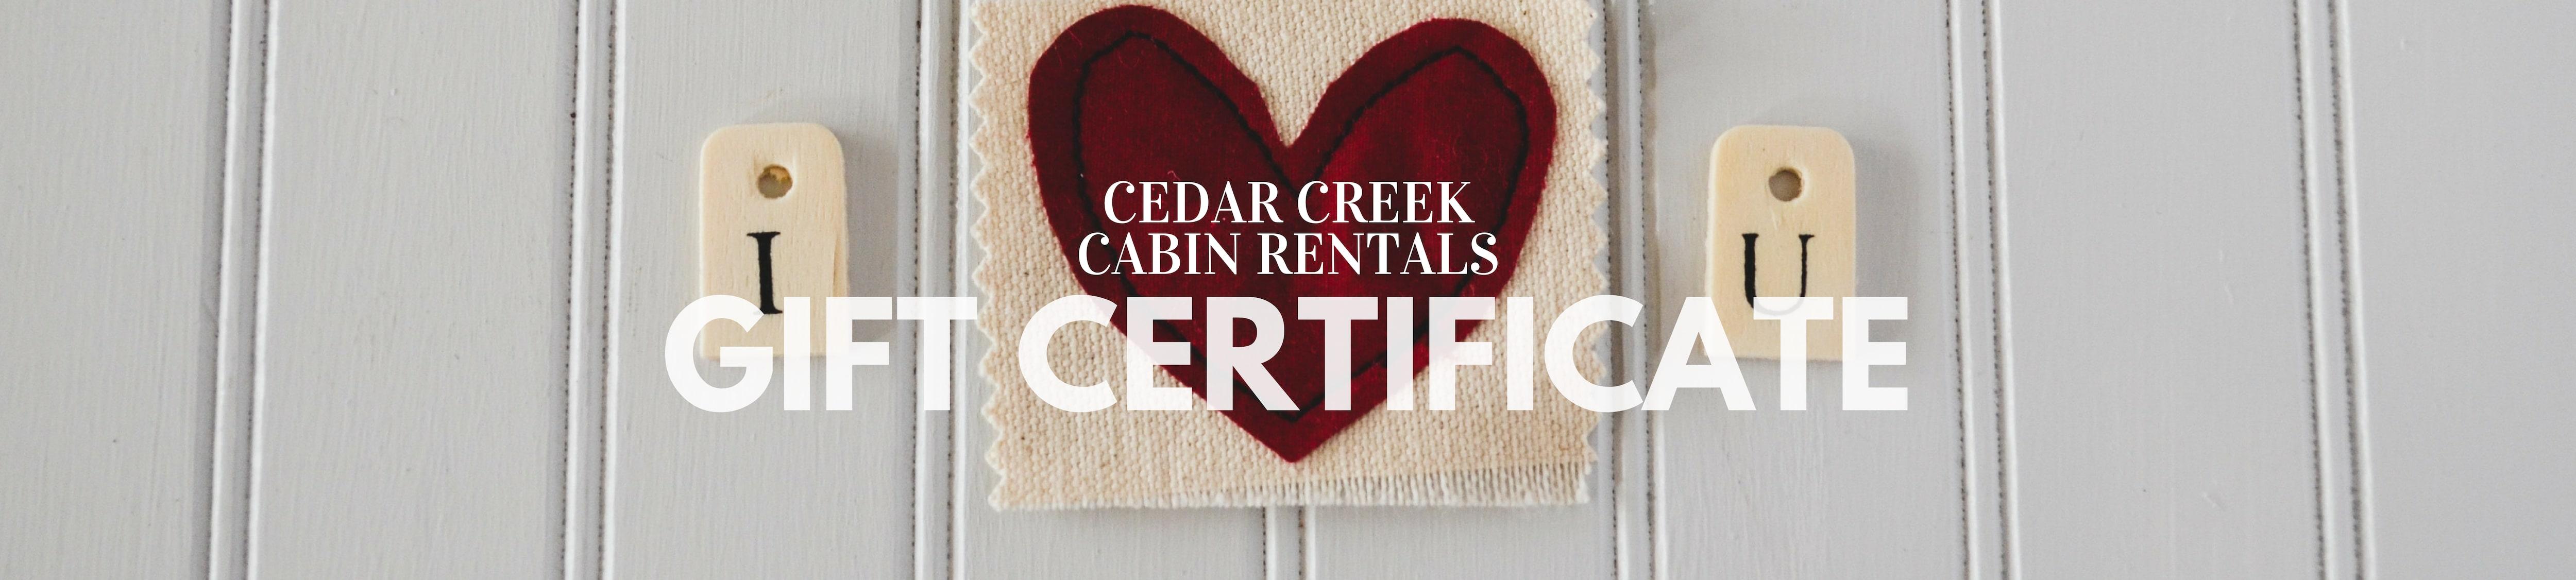 Valintines-Gift-Certificate-Cedar-Creek-Cabin-Rentals-Helen-Georgia-Banner-Photo-by-Debby-Hudson-on-Unsplash